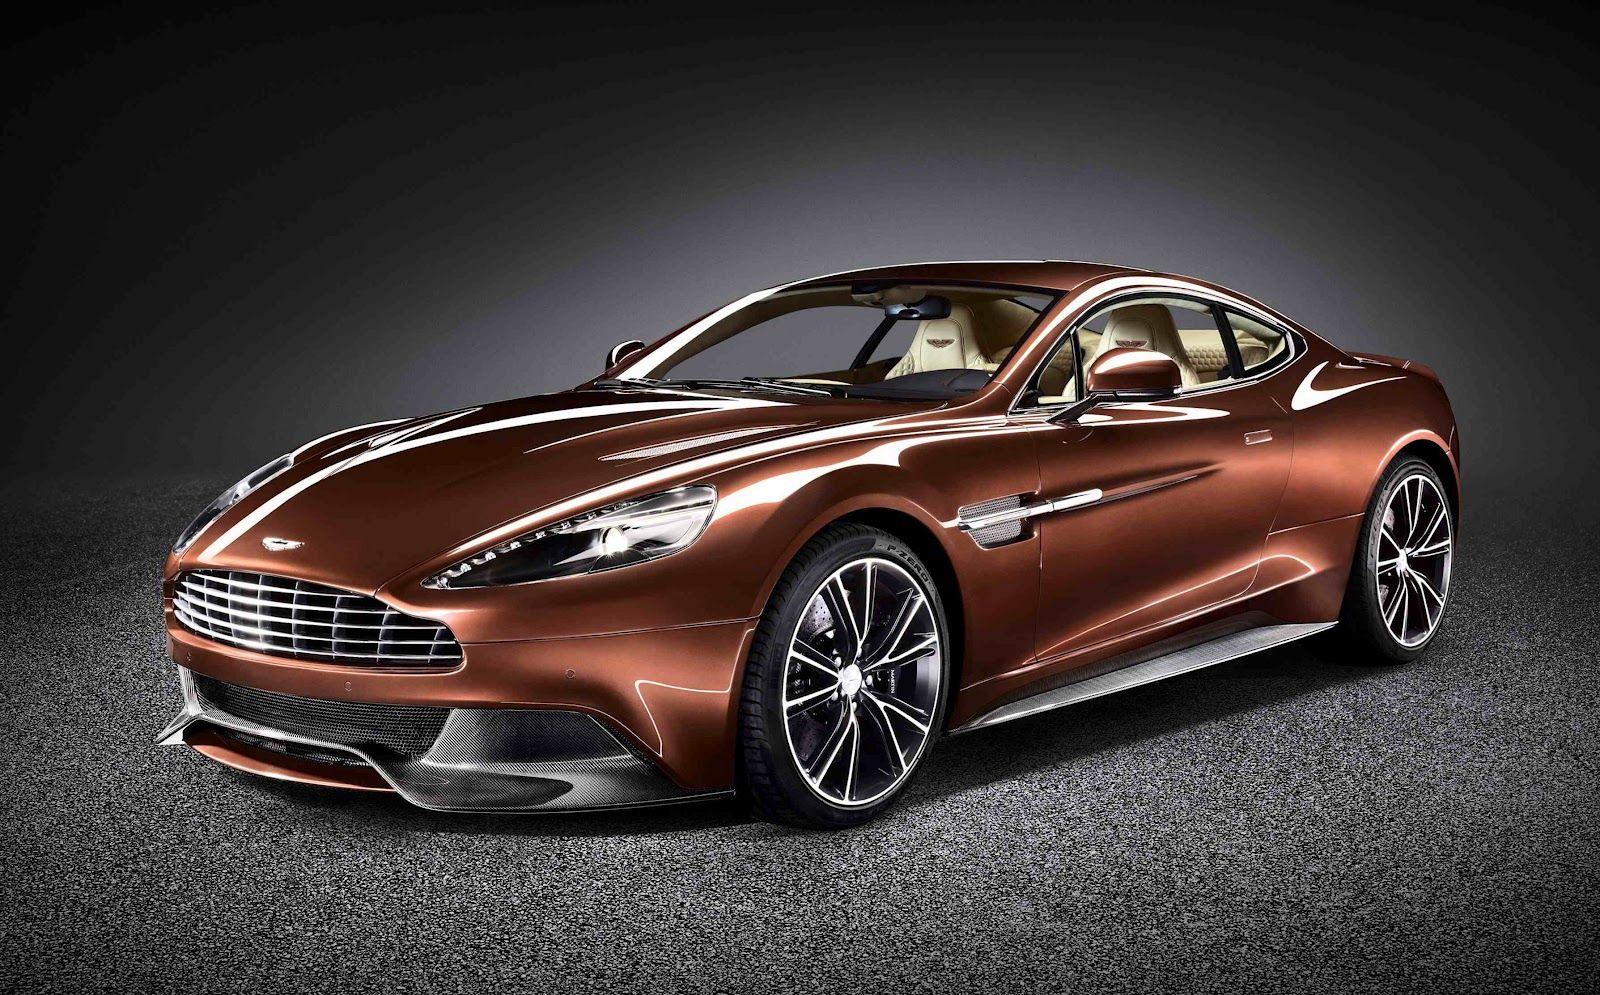 ... Car+Travel Magazine: Aston Martin